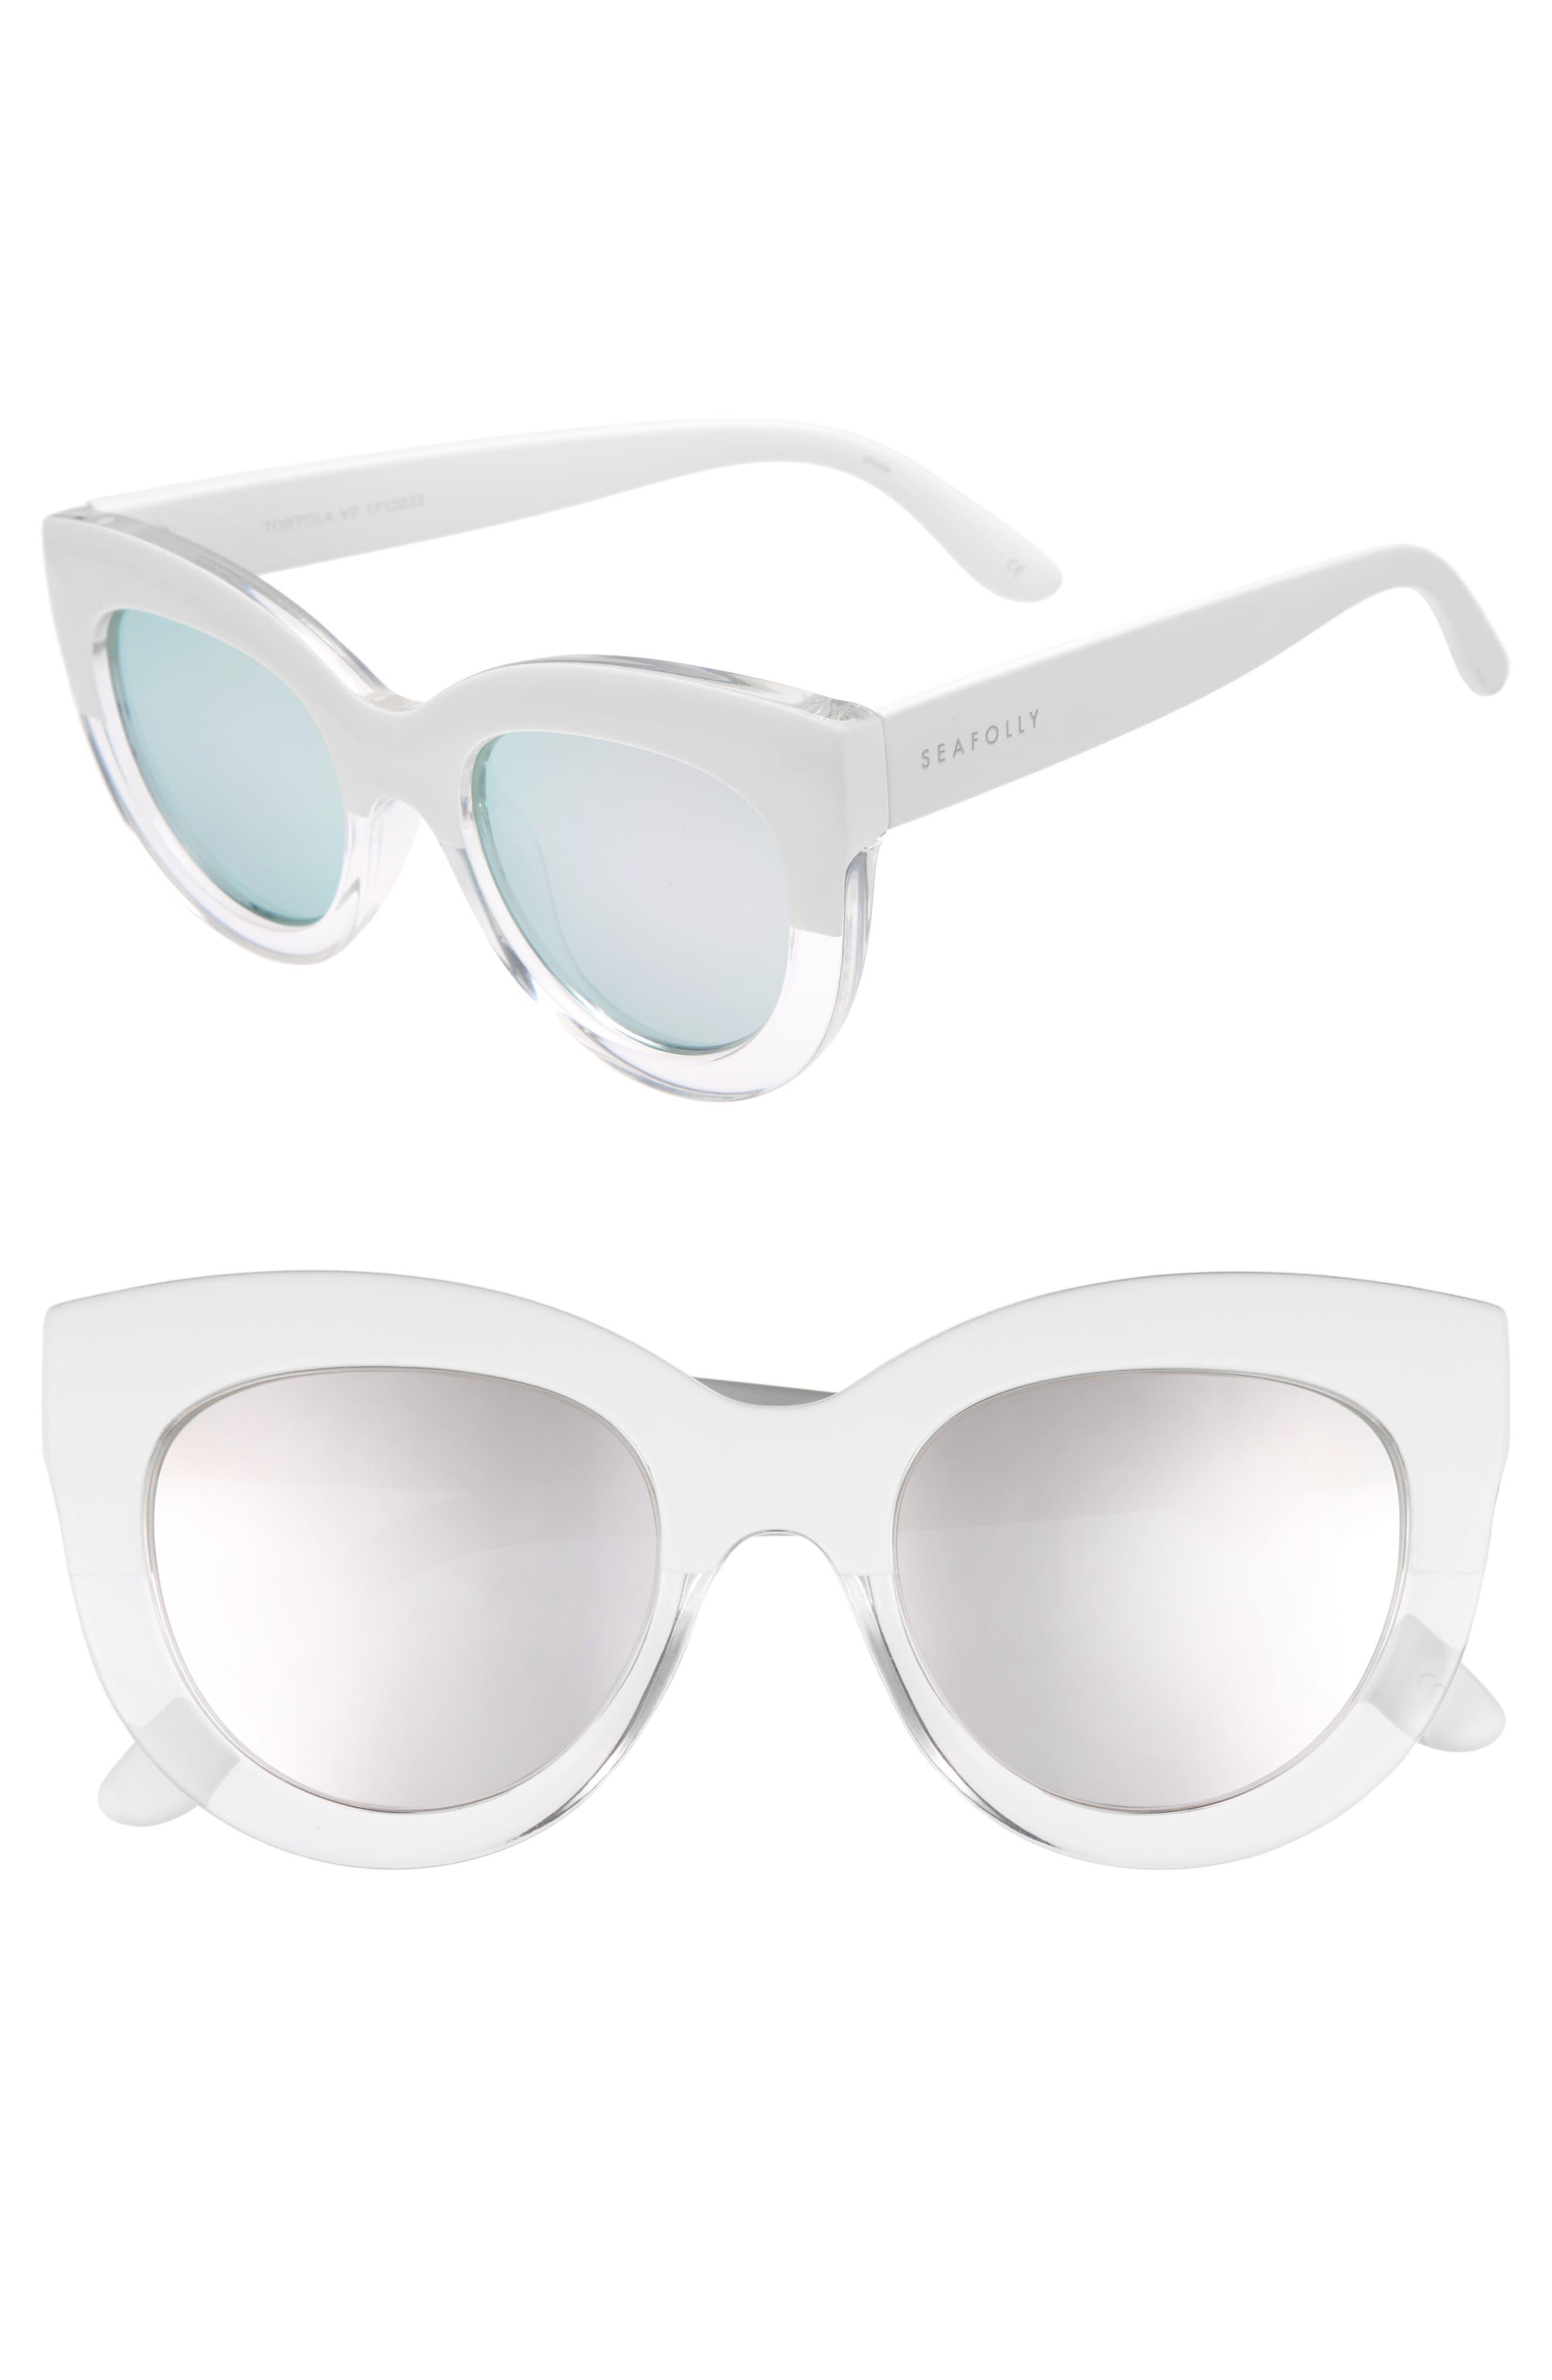 Tortola V2 51mm Polarized Cat Eye Sunglasses,                         Main,                         color, White Splice